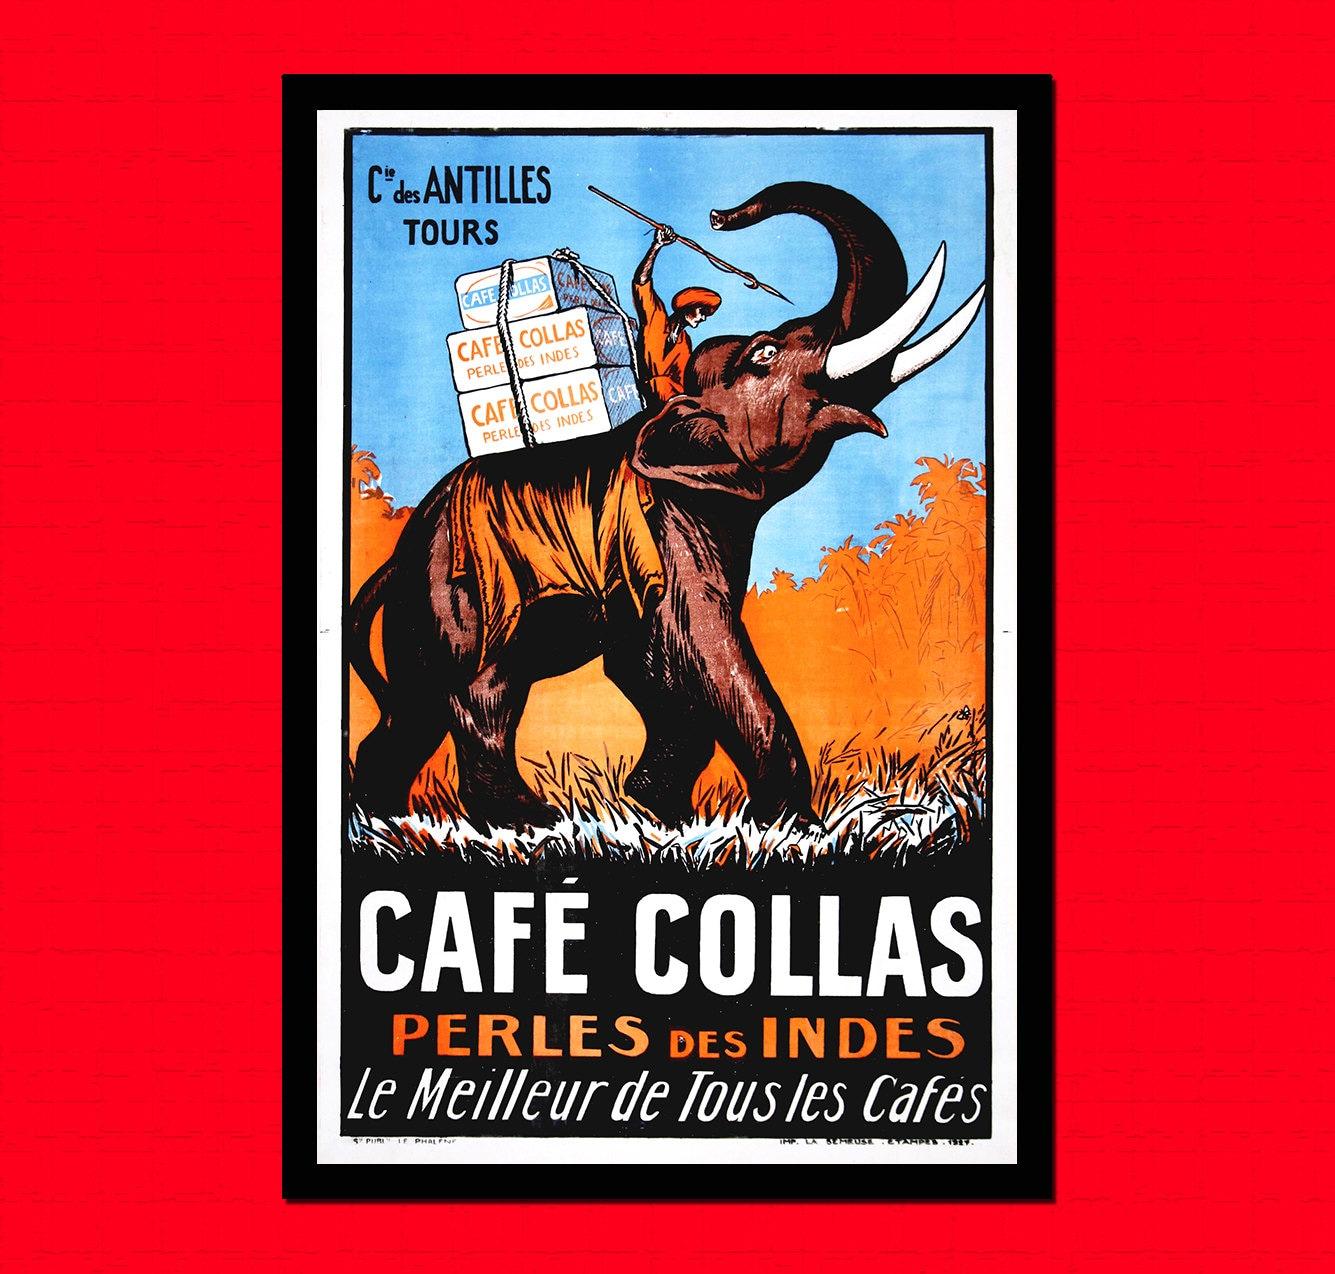 Cafe Collas Werbedruck 1927 Food Poster Kaffee Poster Küche